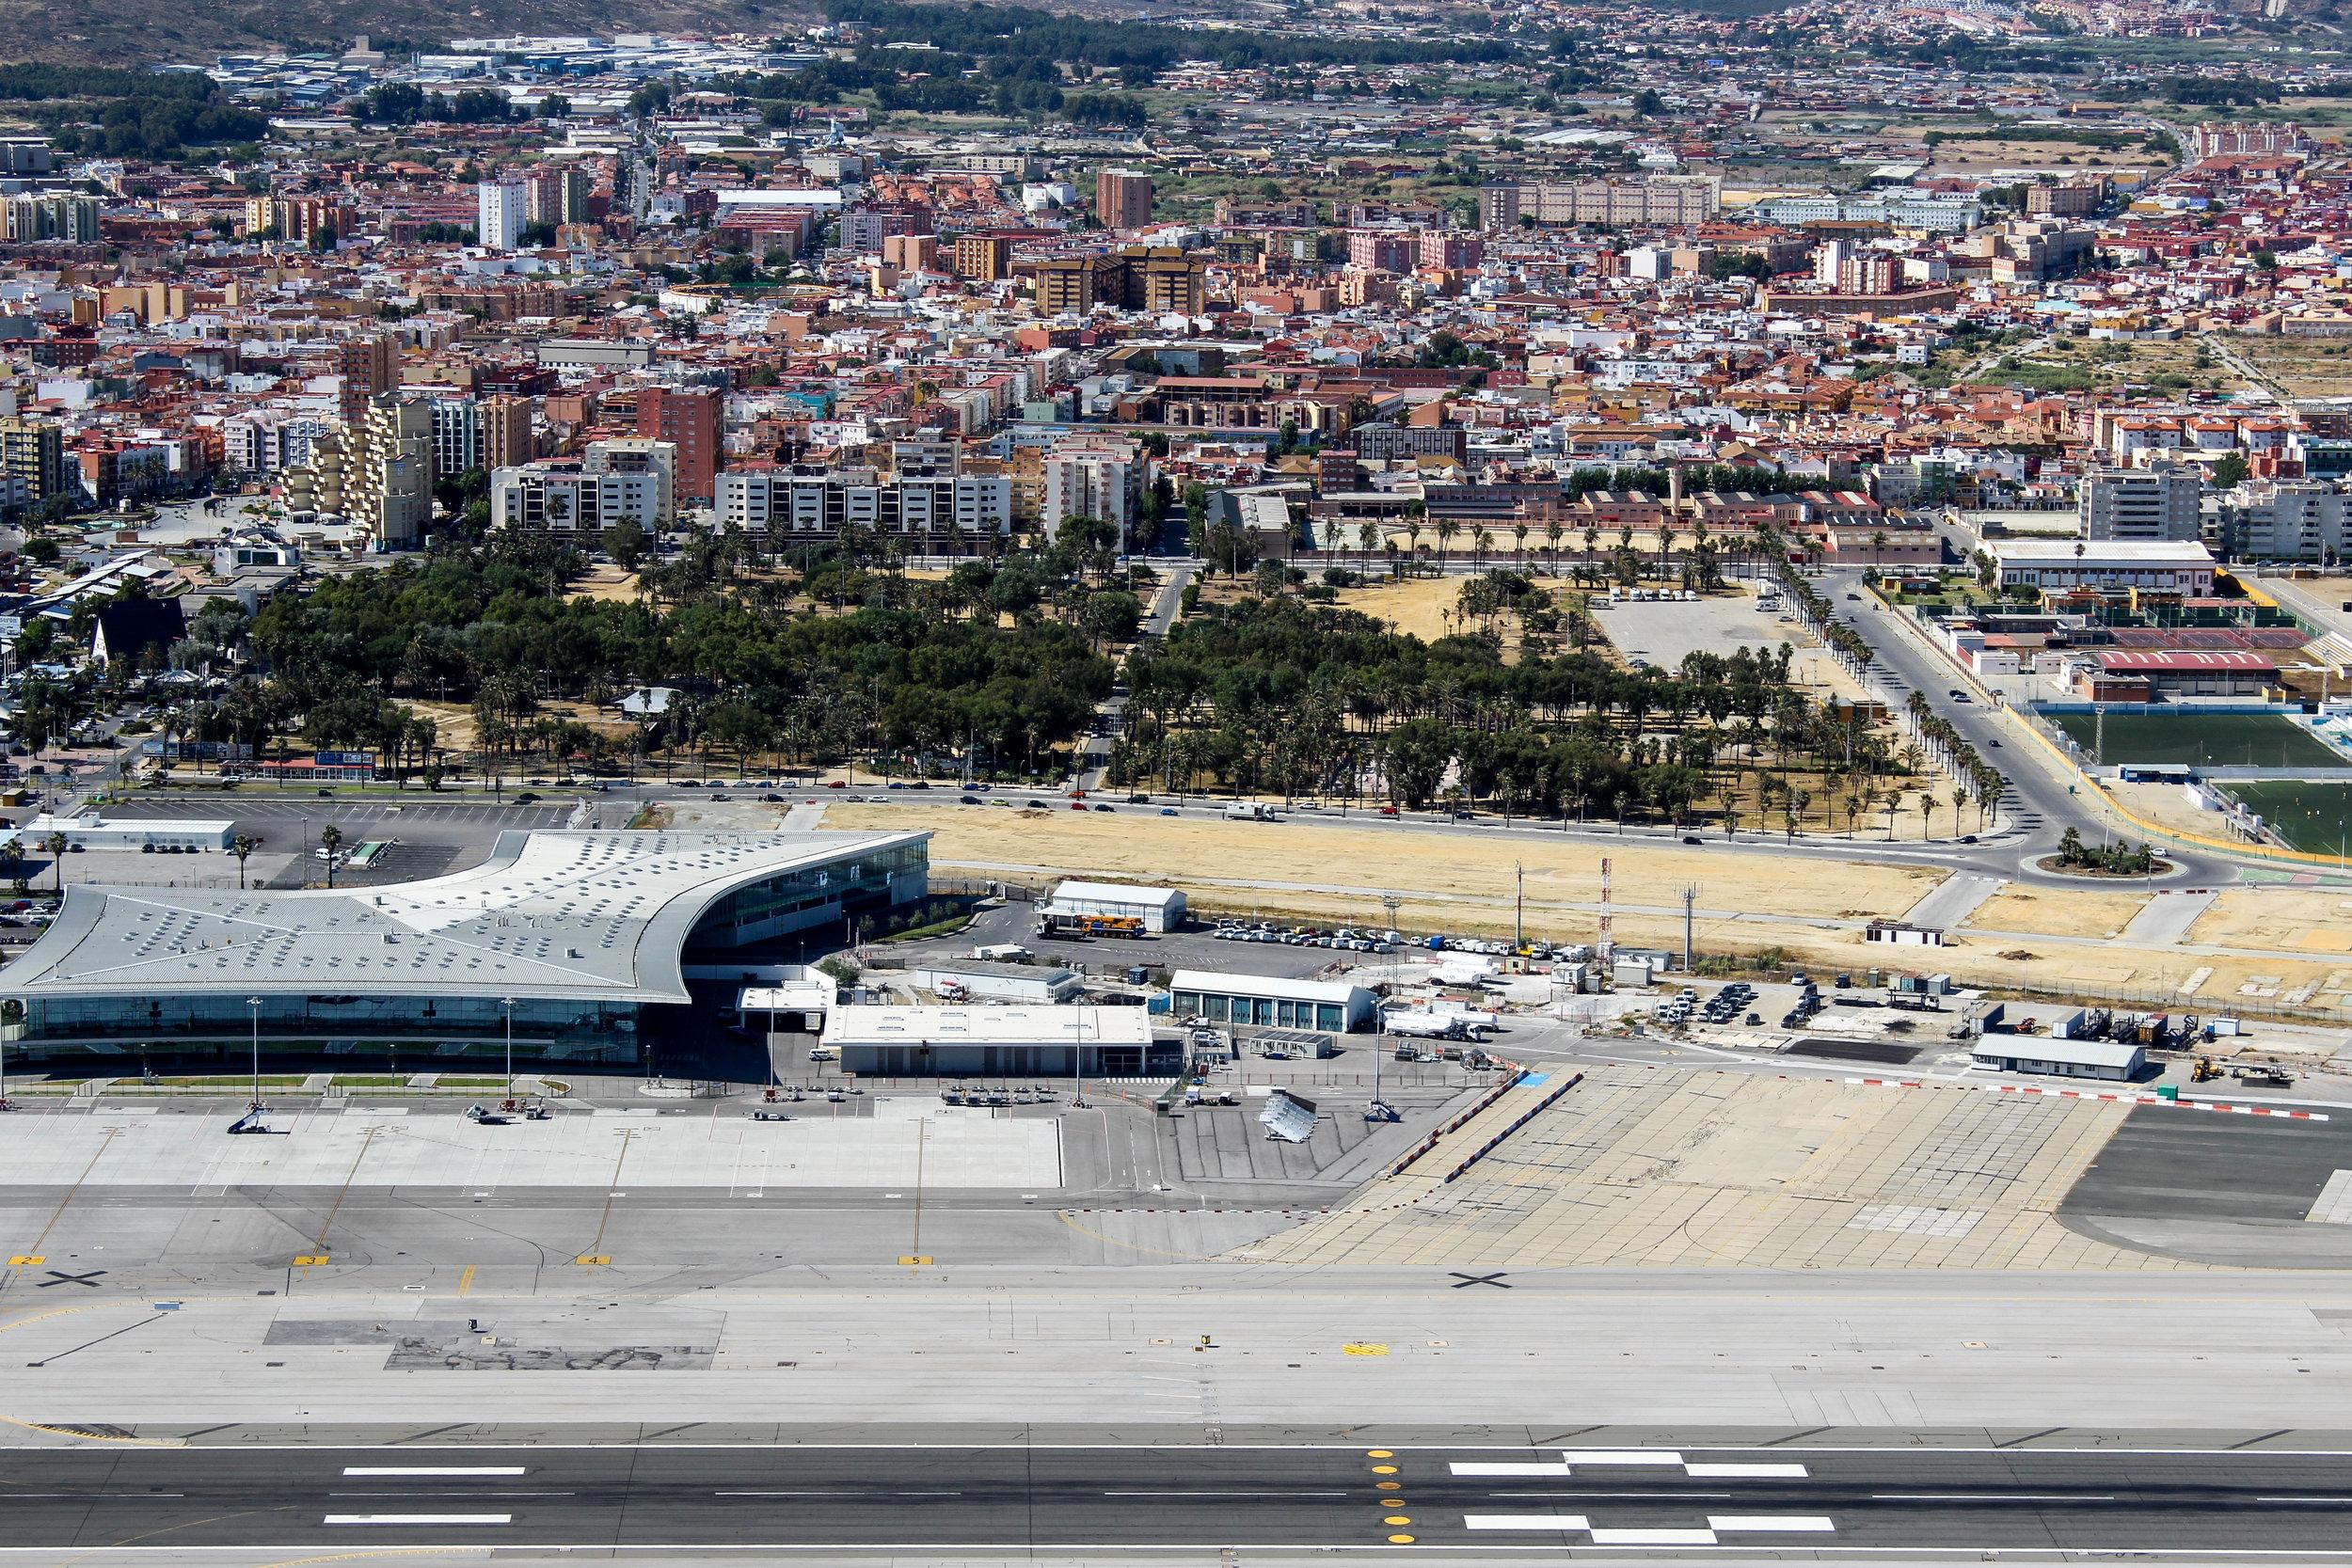 La Linea de la Concepcion, Cádiz, Andalusia, Spain, Mediterranean Sea, Gibraltar International Airport, Gibraltar, British Overseas Territory, Europe | www.DoLessGetMoreDone.com |